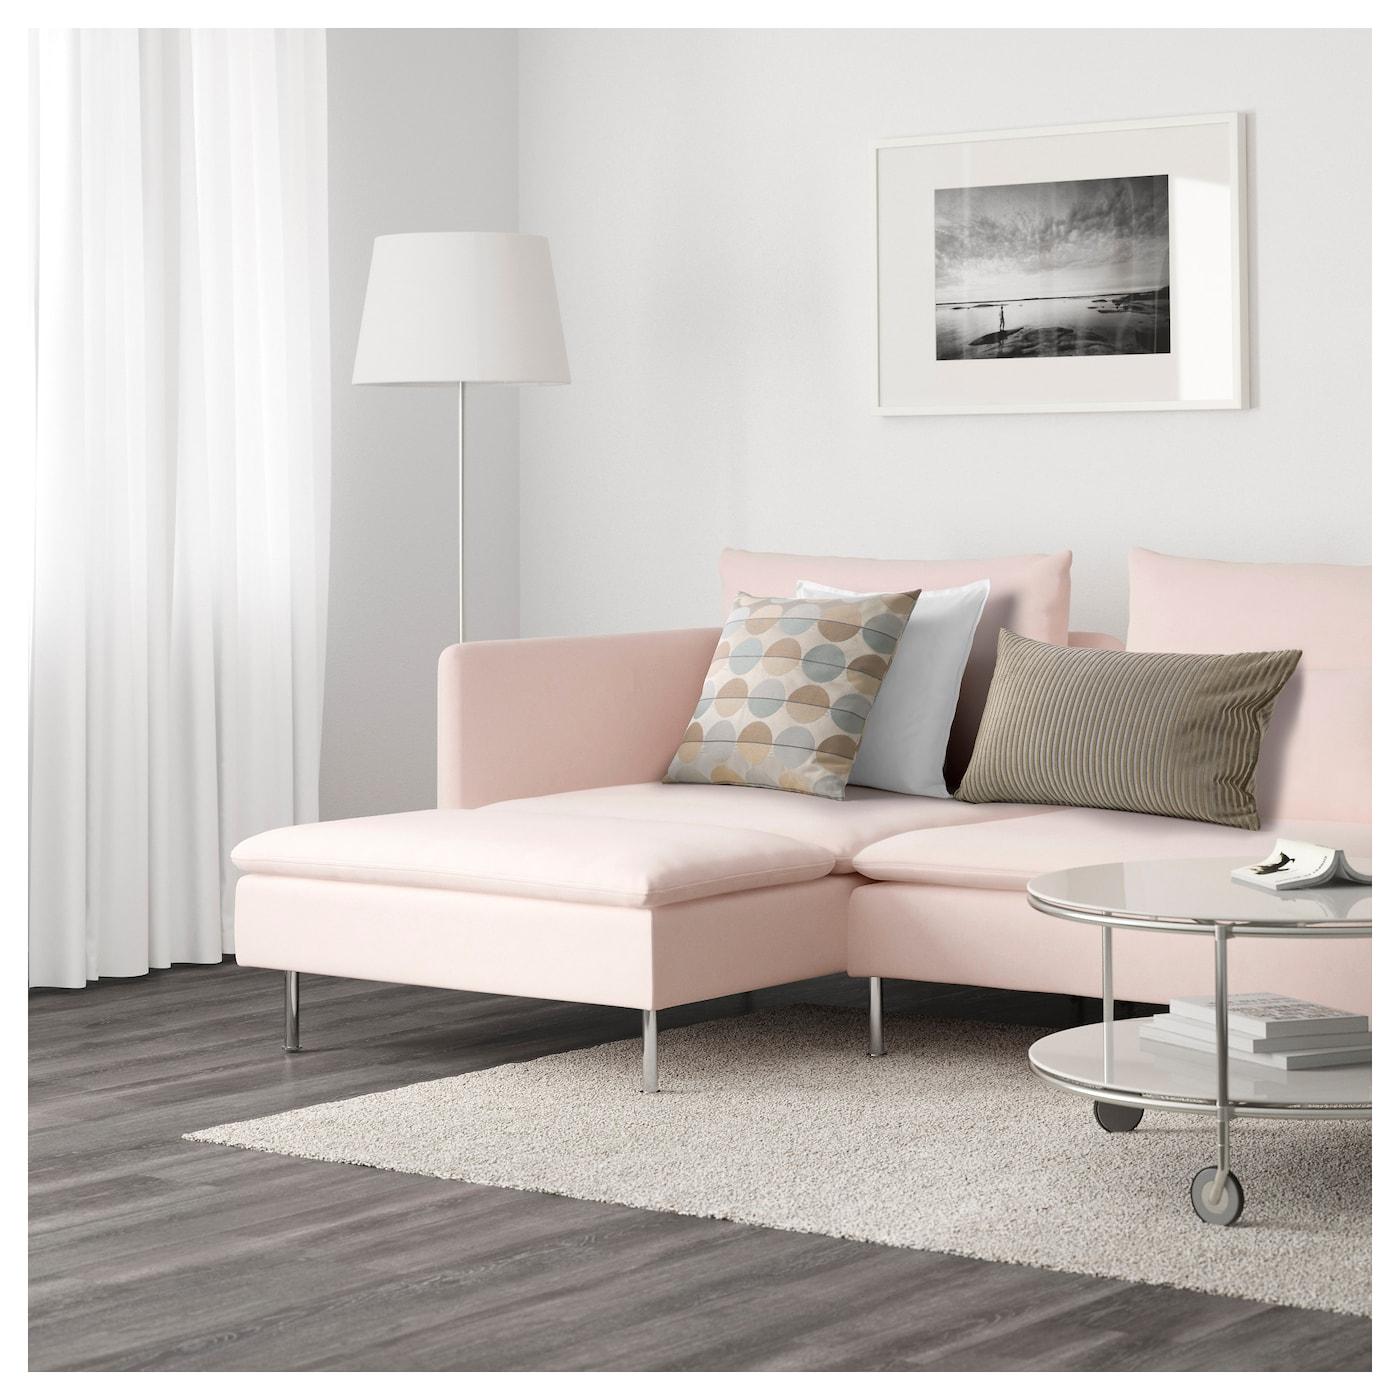 s derhamn 4 seat sofa with chaise longue samsta light pink ikea rh ikea com pale pink sofa ikea pink corner sofa ikea